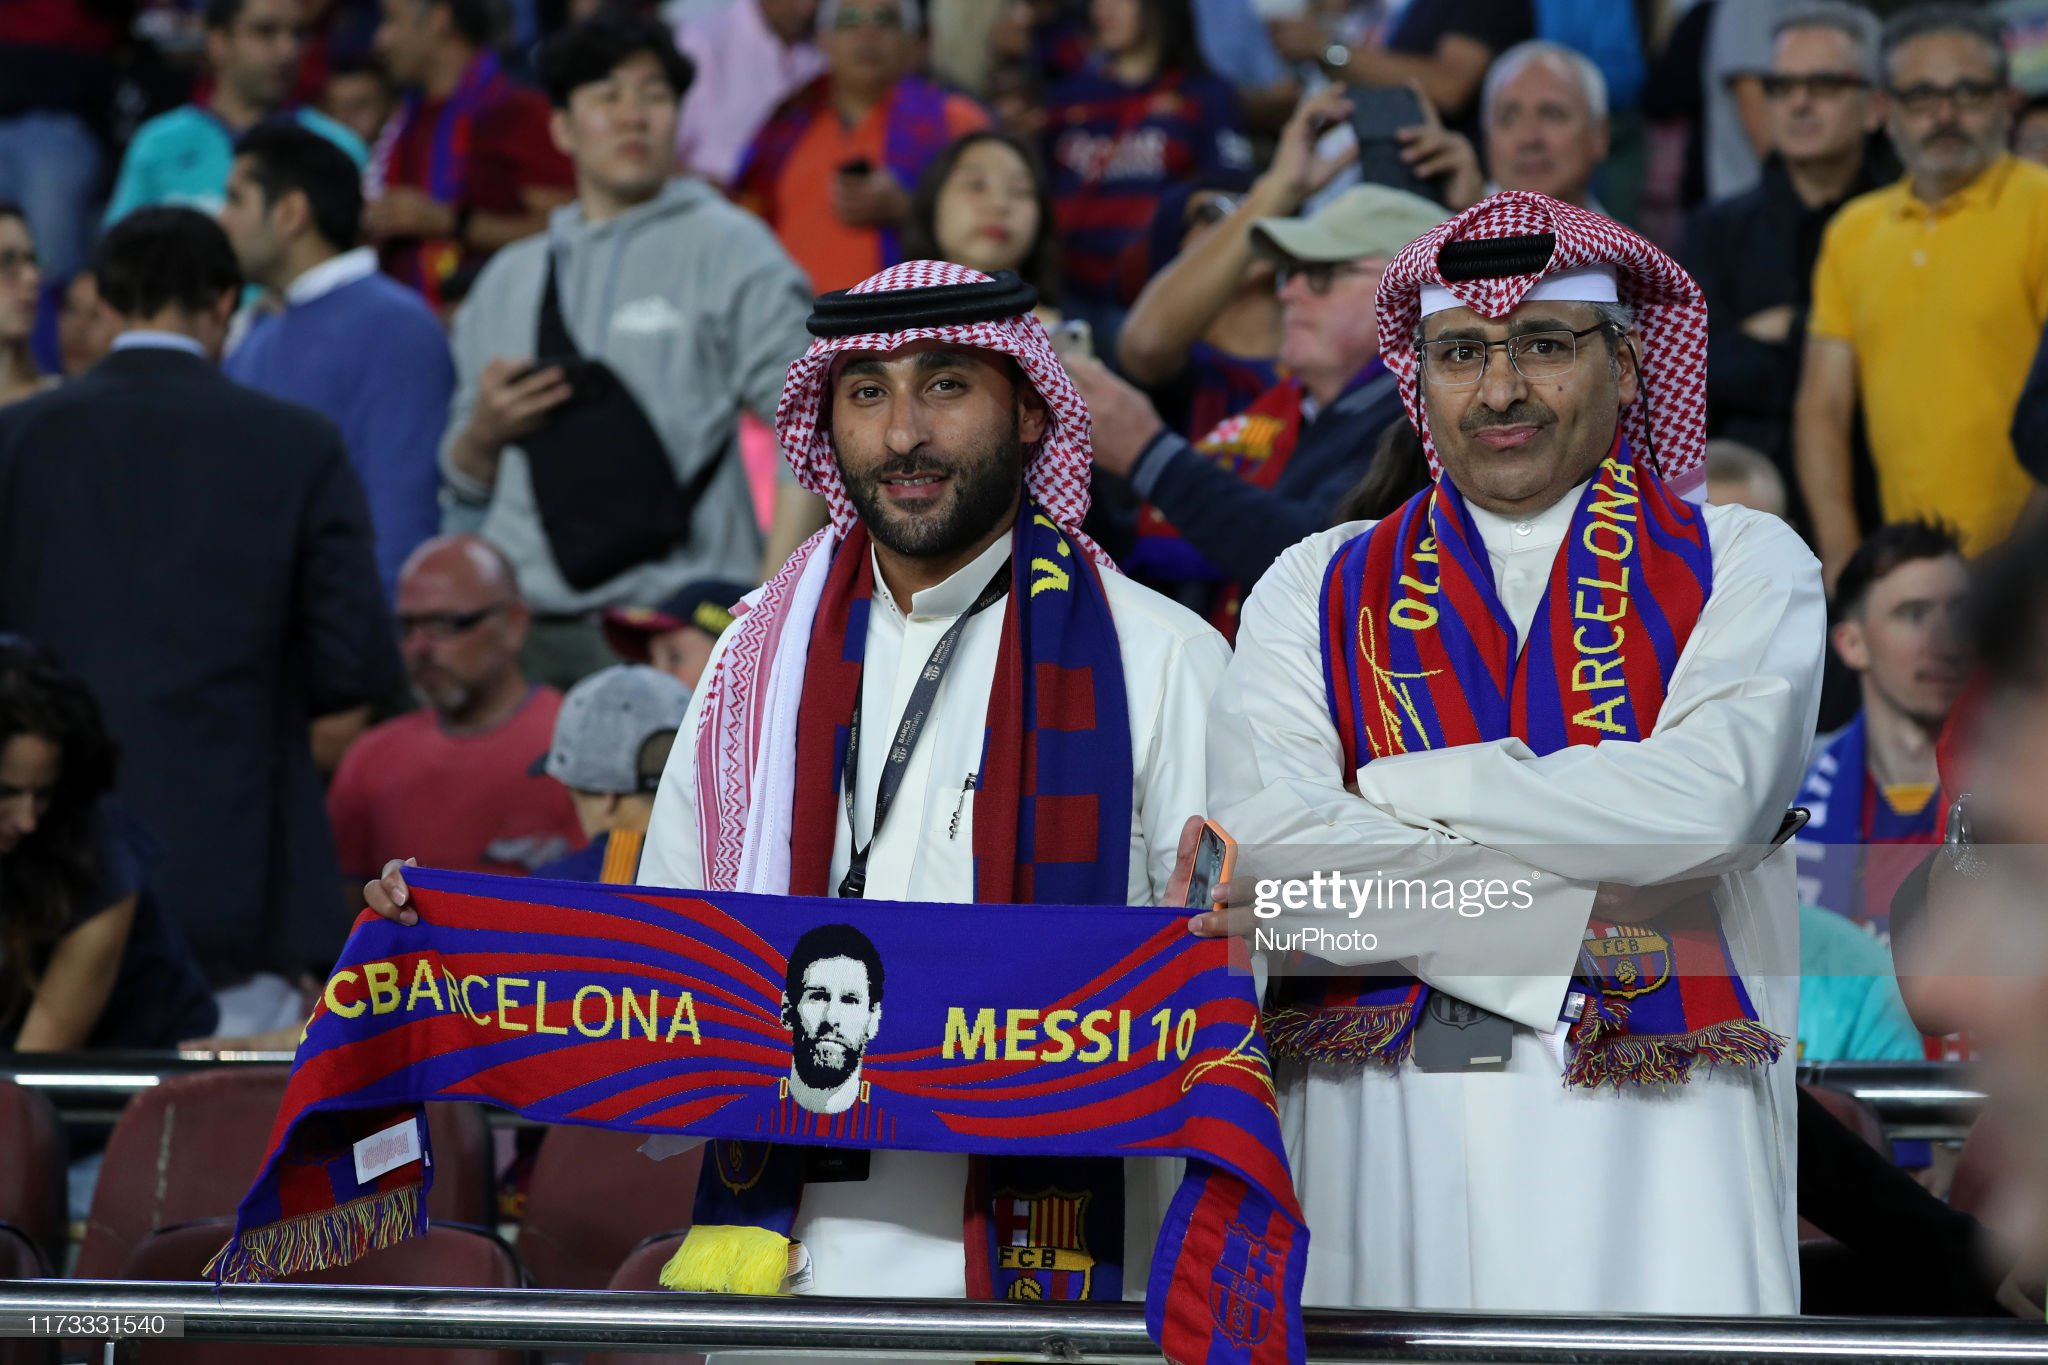 صور مباراة : برشلونة - إنتر 2-1 ( 02-10-2019 )  Supporters-during-the-match-between-fc-barcelona-between-inter-to-picture-id1173331540?s=2048x2048